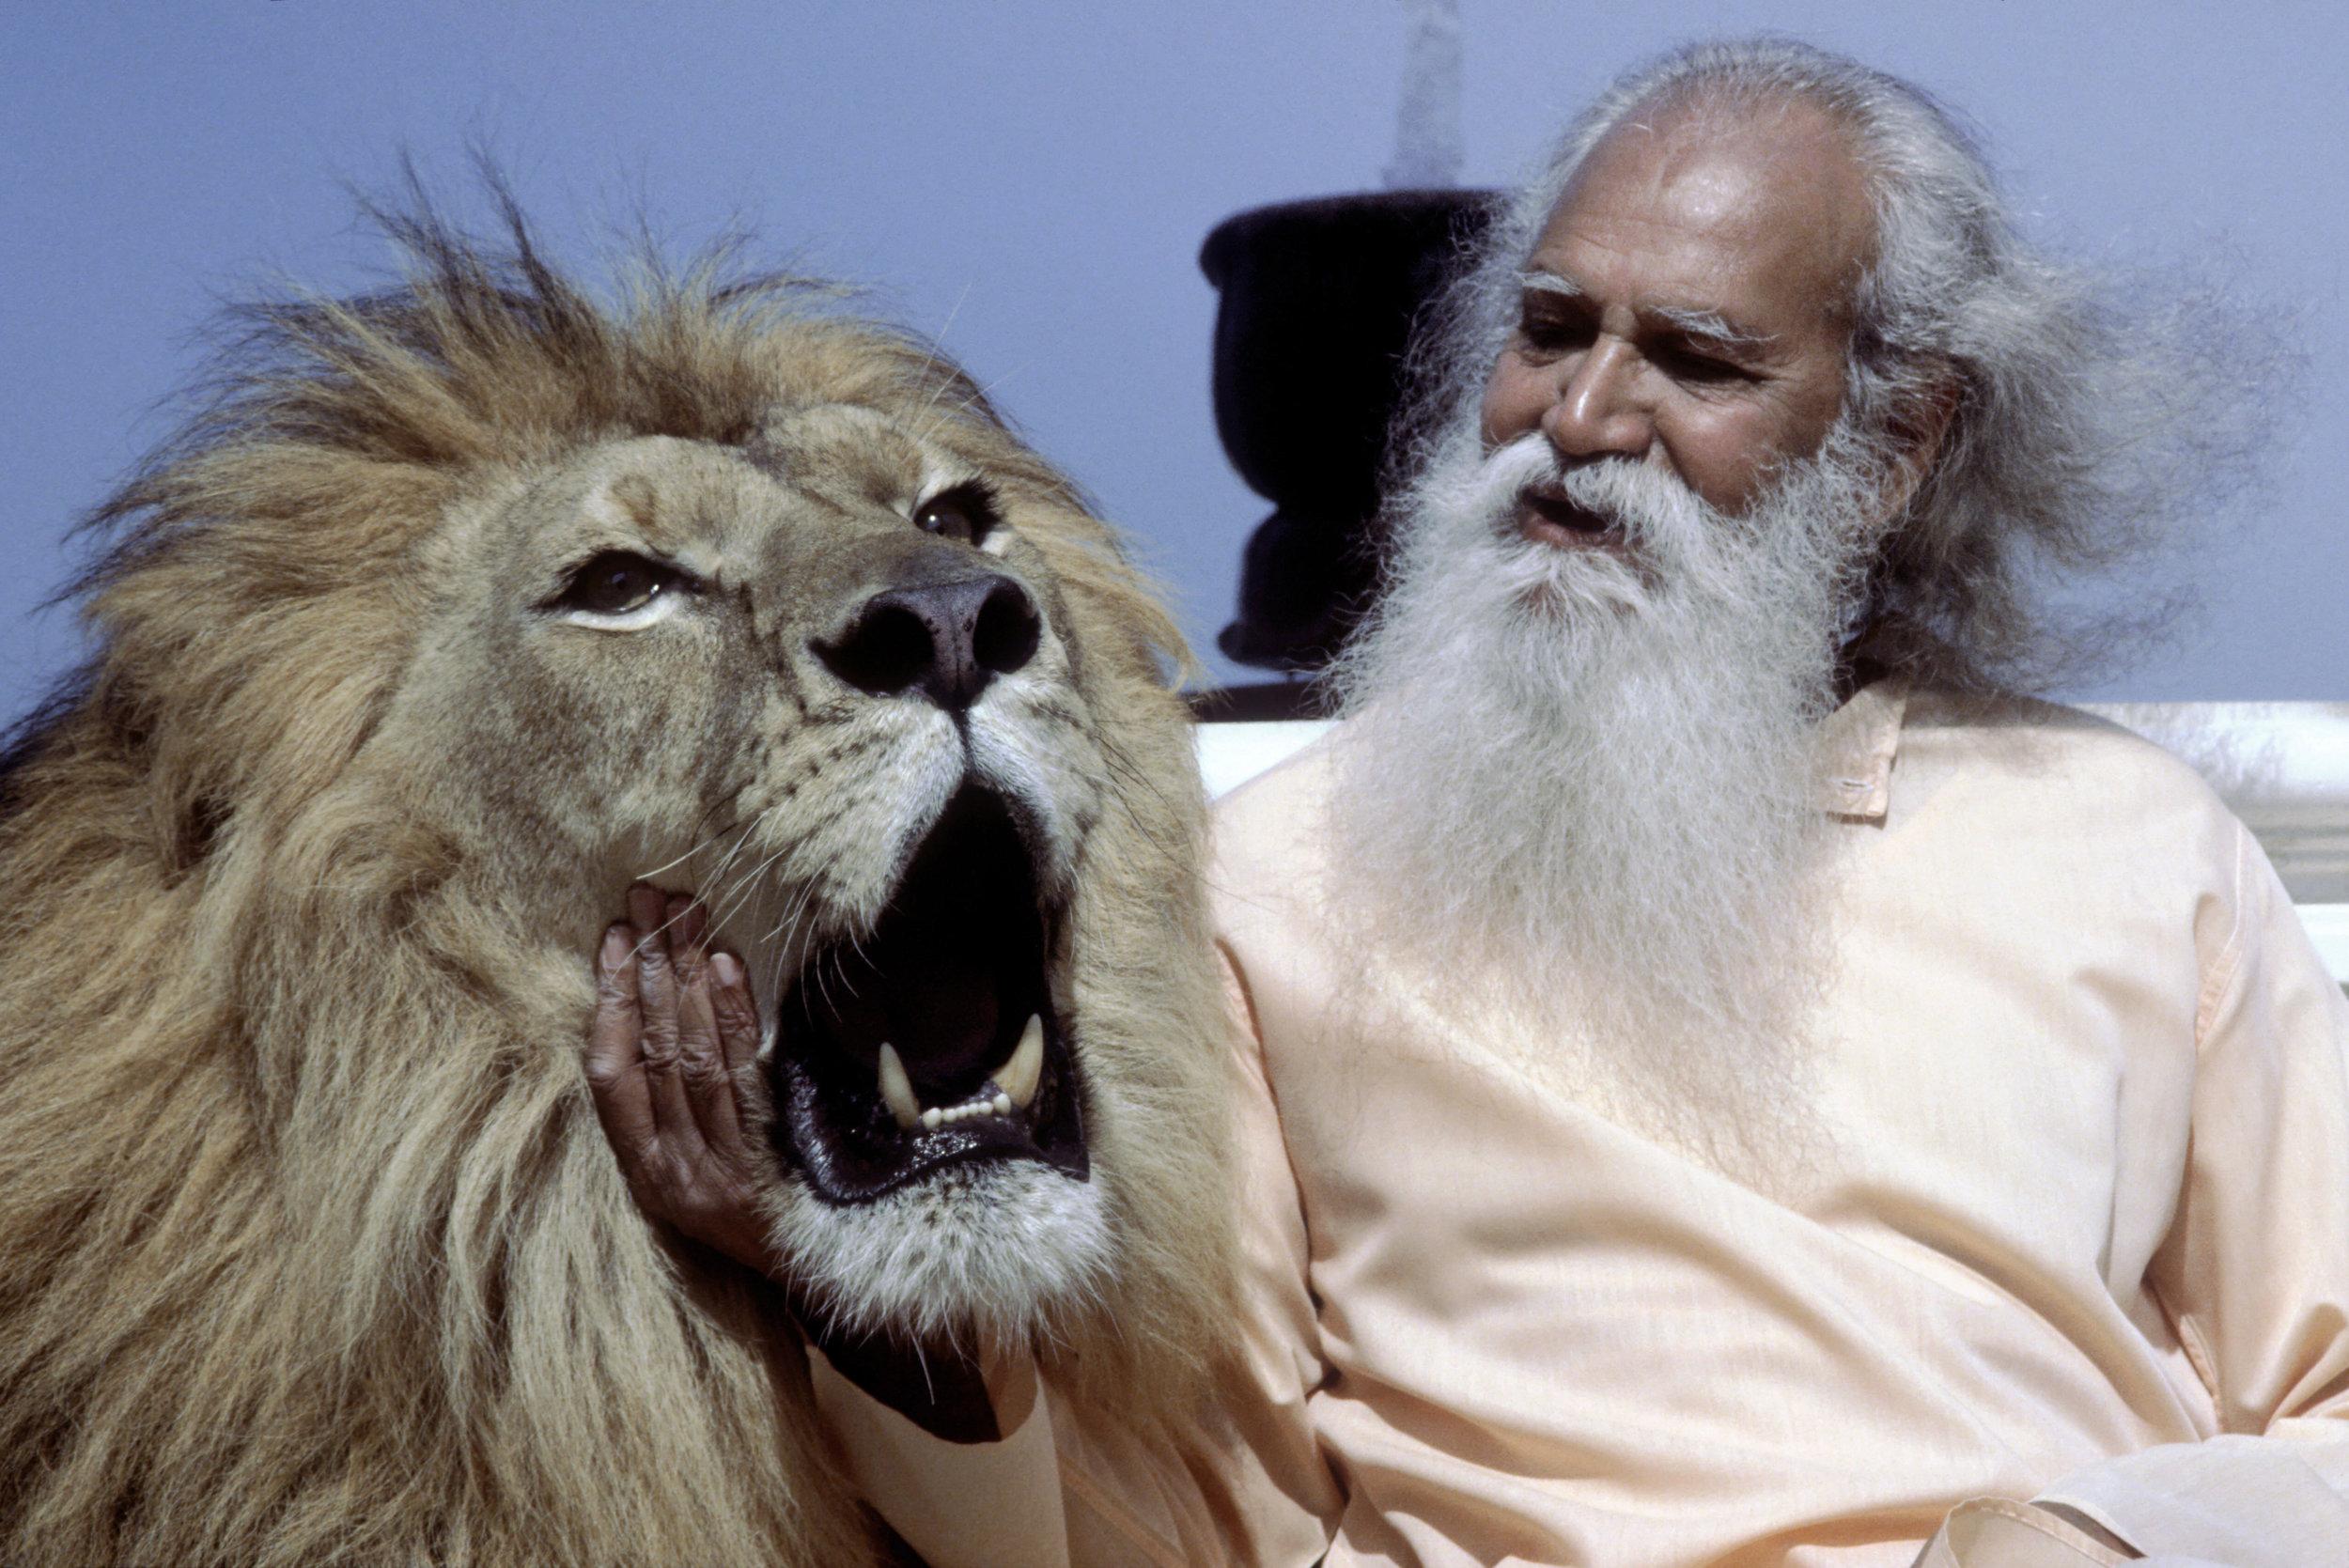 press-Swami-Satchidananda-MGM-Lion.jpg